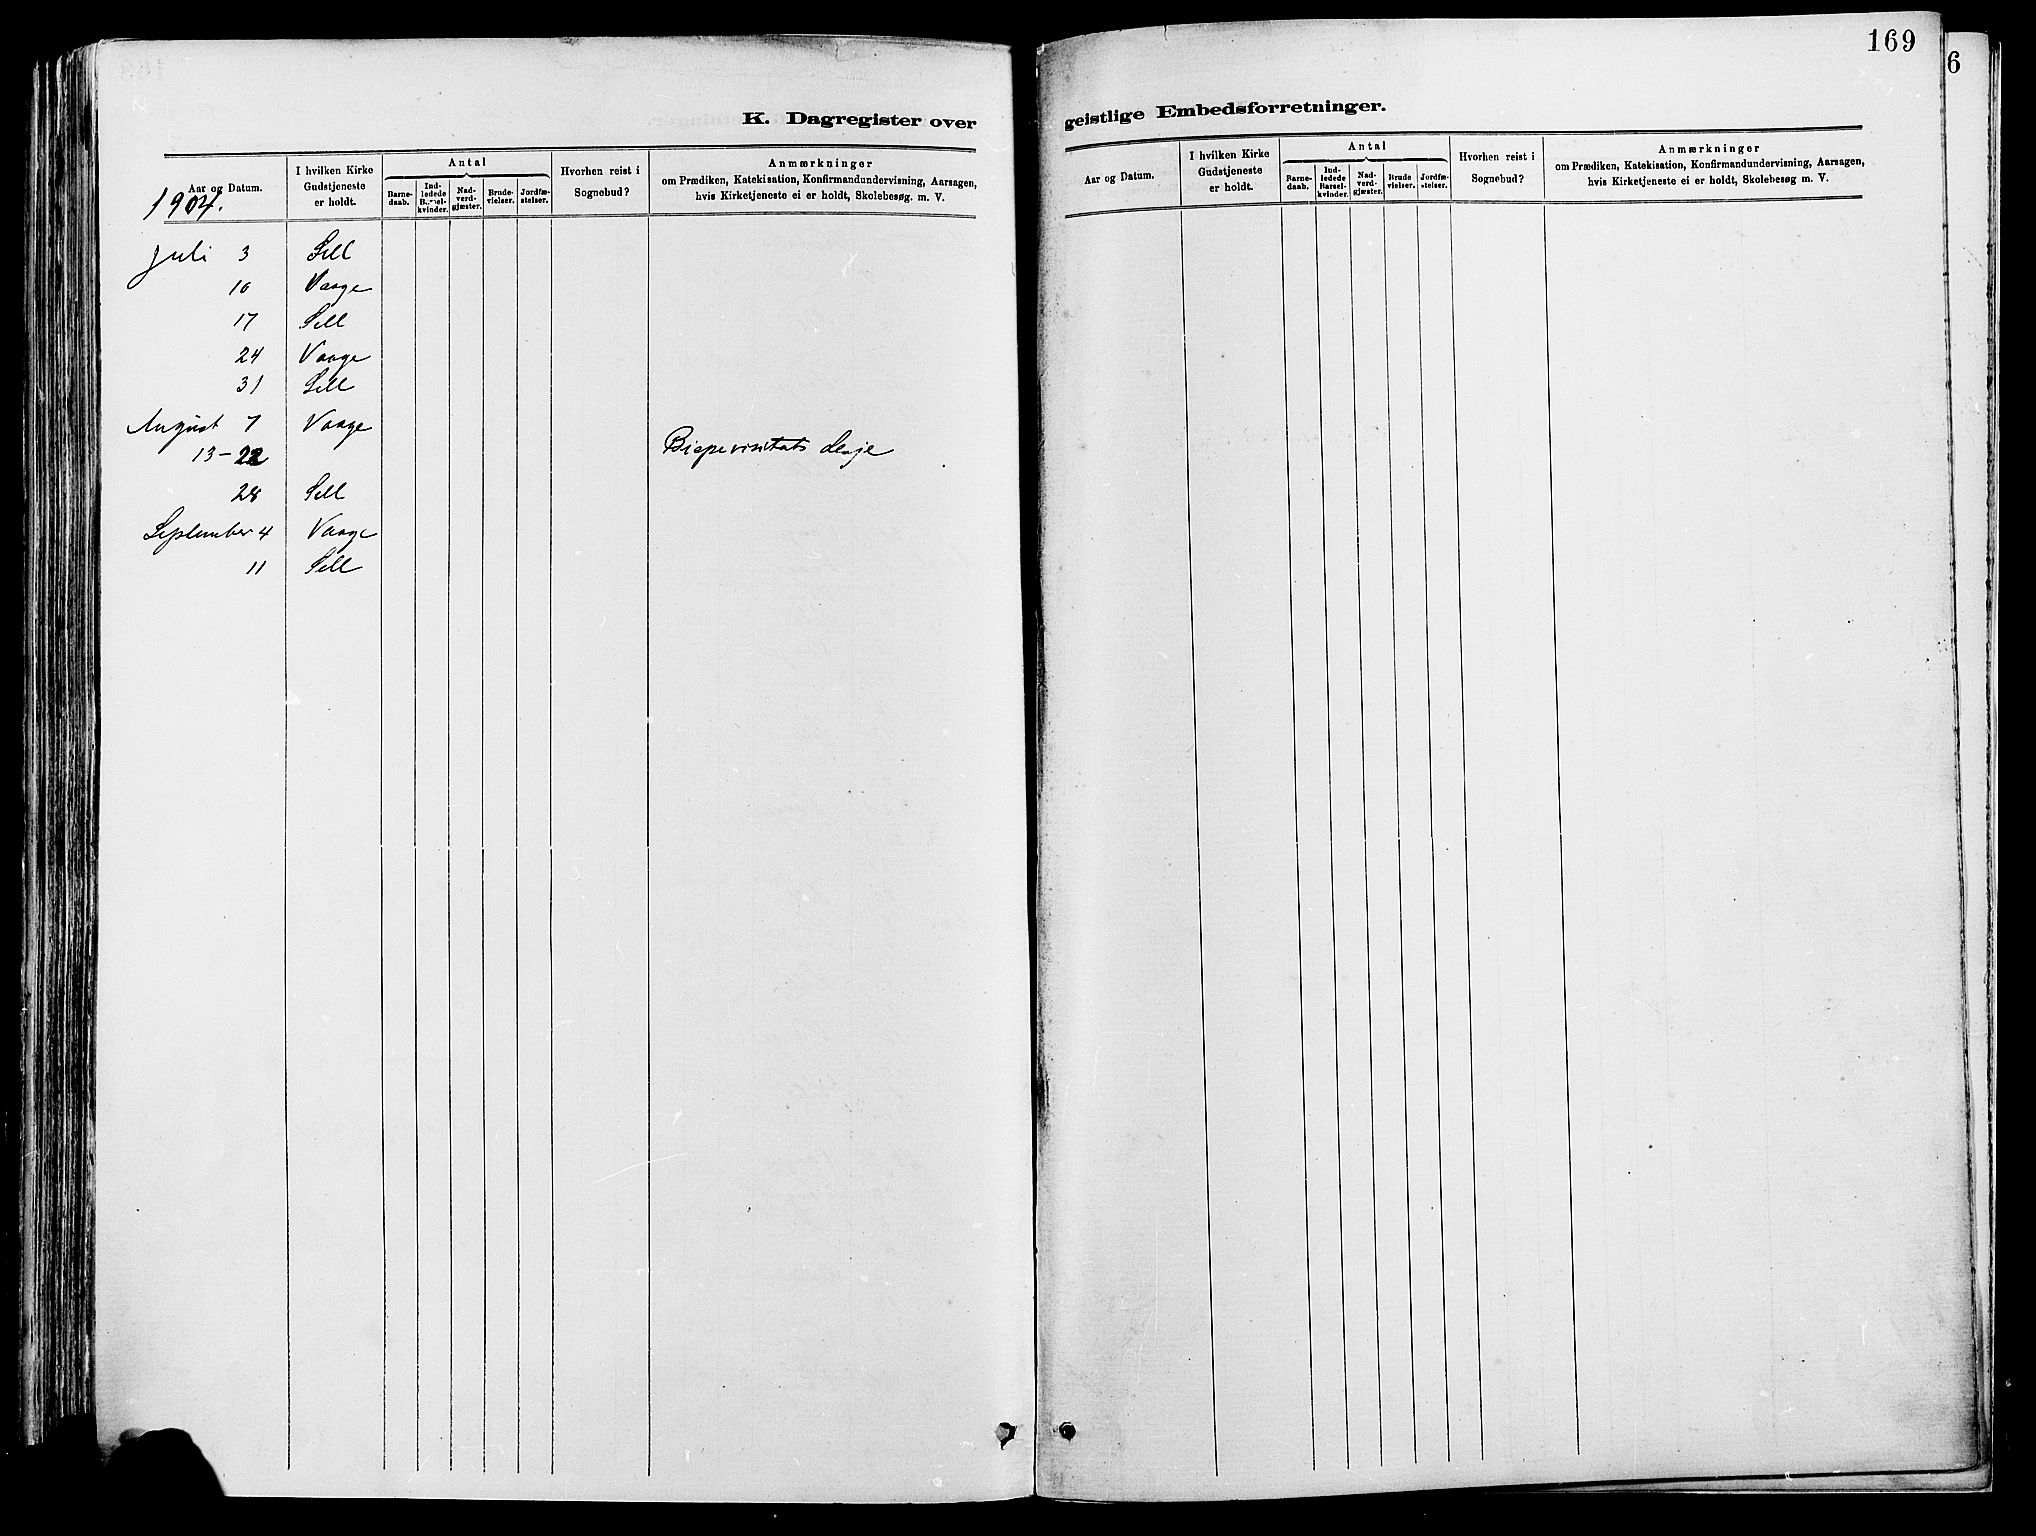 SAH, Vågå prestekontor, Ministerialbok nr. 8, 1886-1904, s. 169